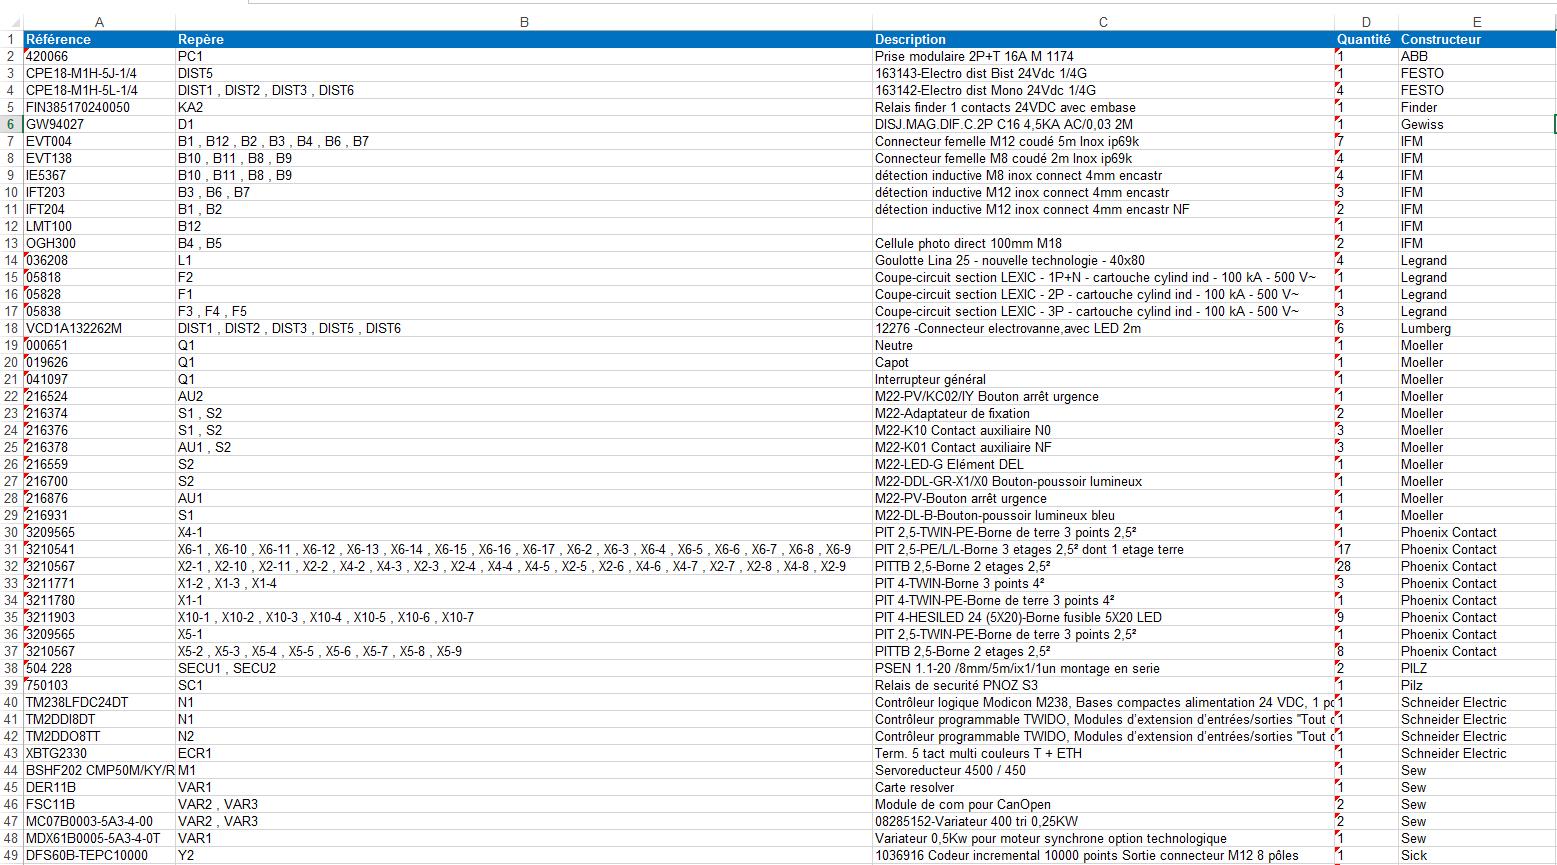 Electrical project data in excel format trace software export des nomenclatures matriel au format excel dans elecworks alramifo Image collections